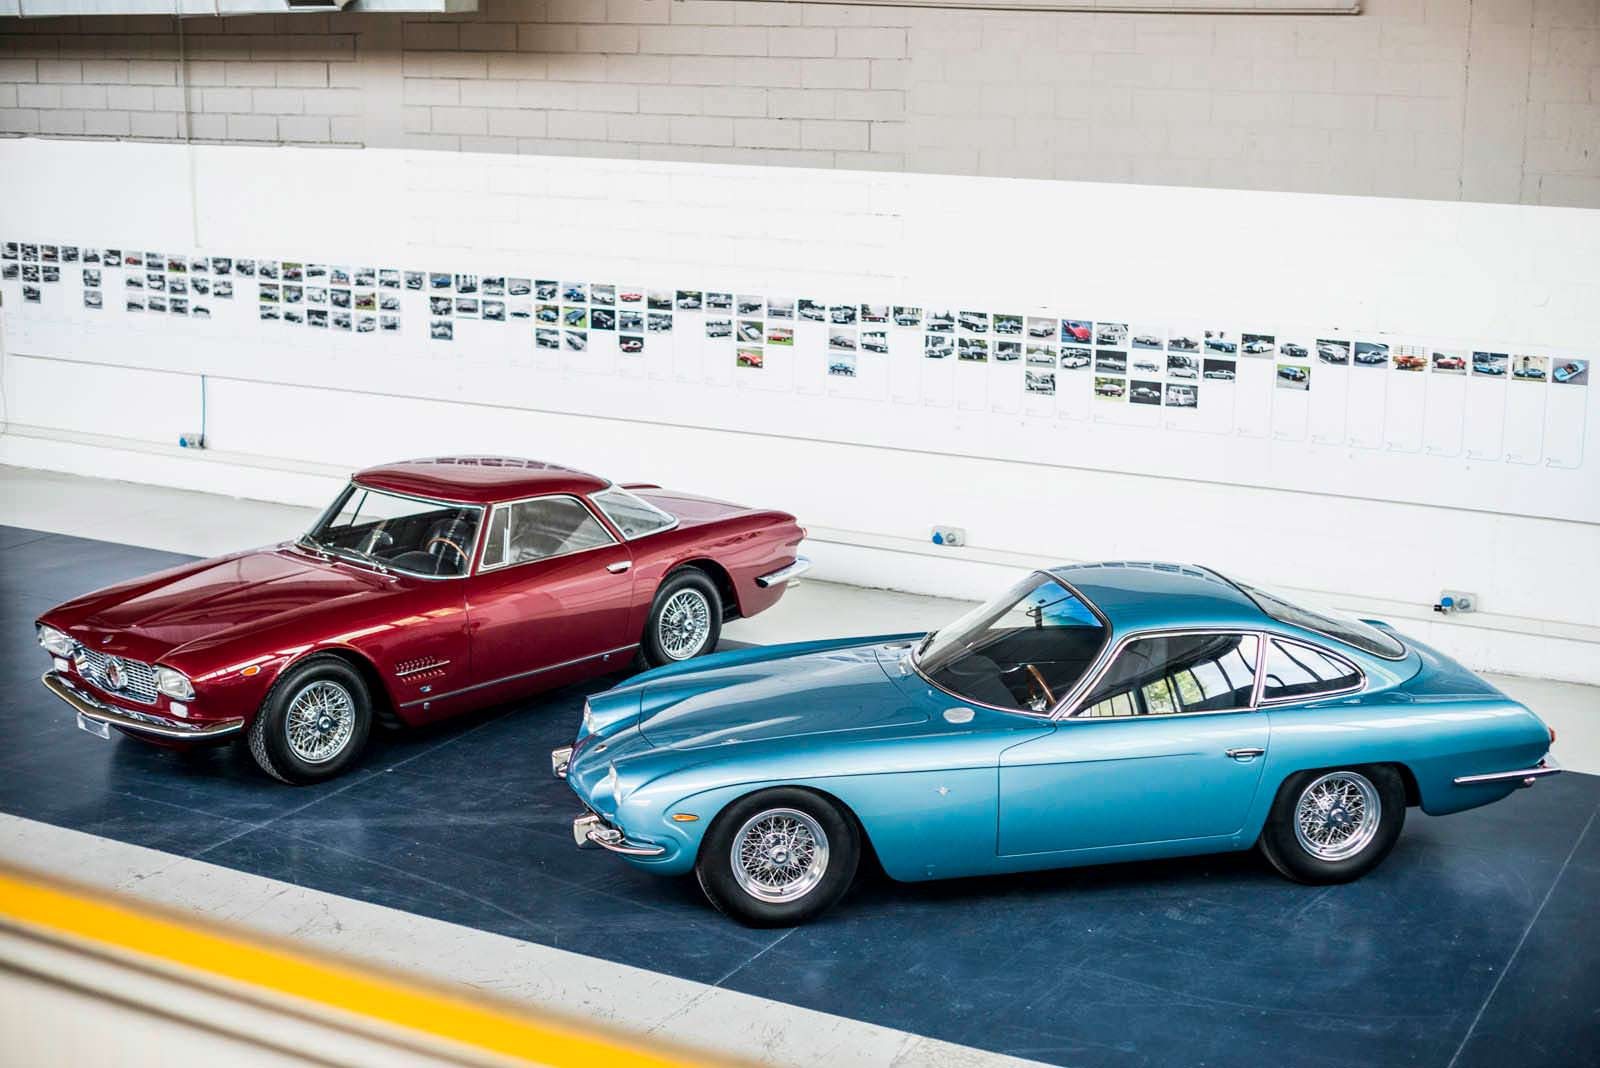 Раритетные Maserati 5000 GT и Lamborghini 350 GT